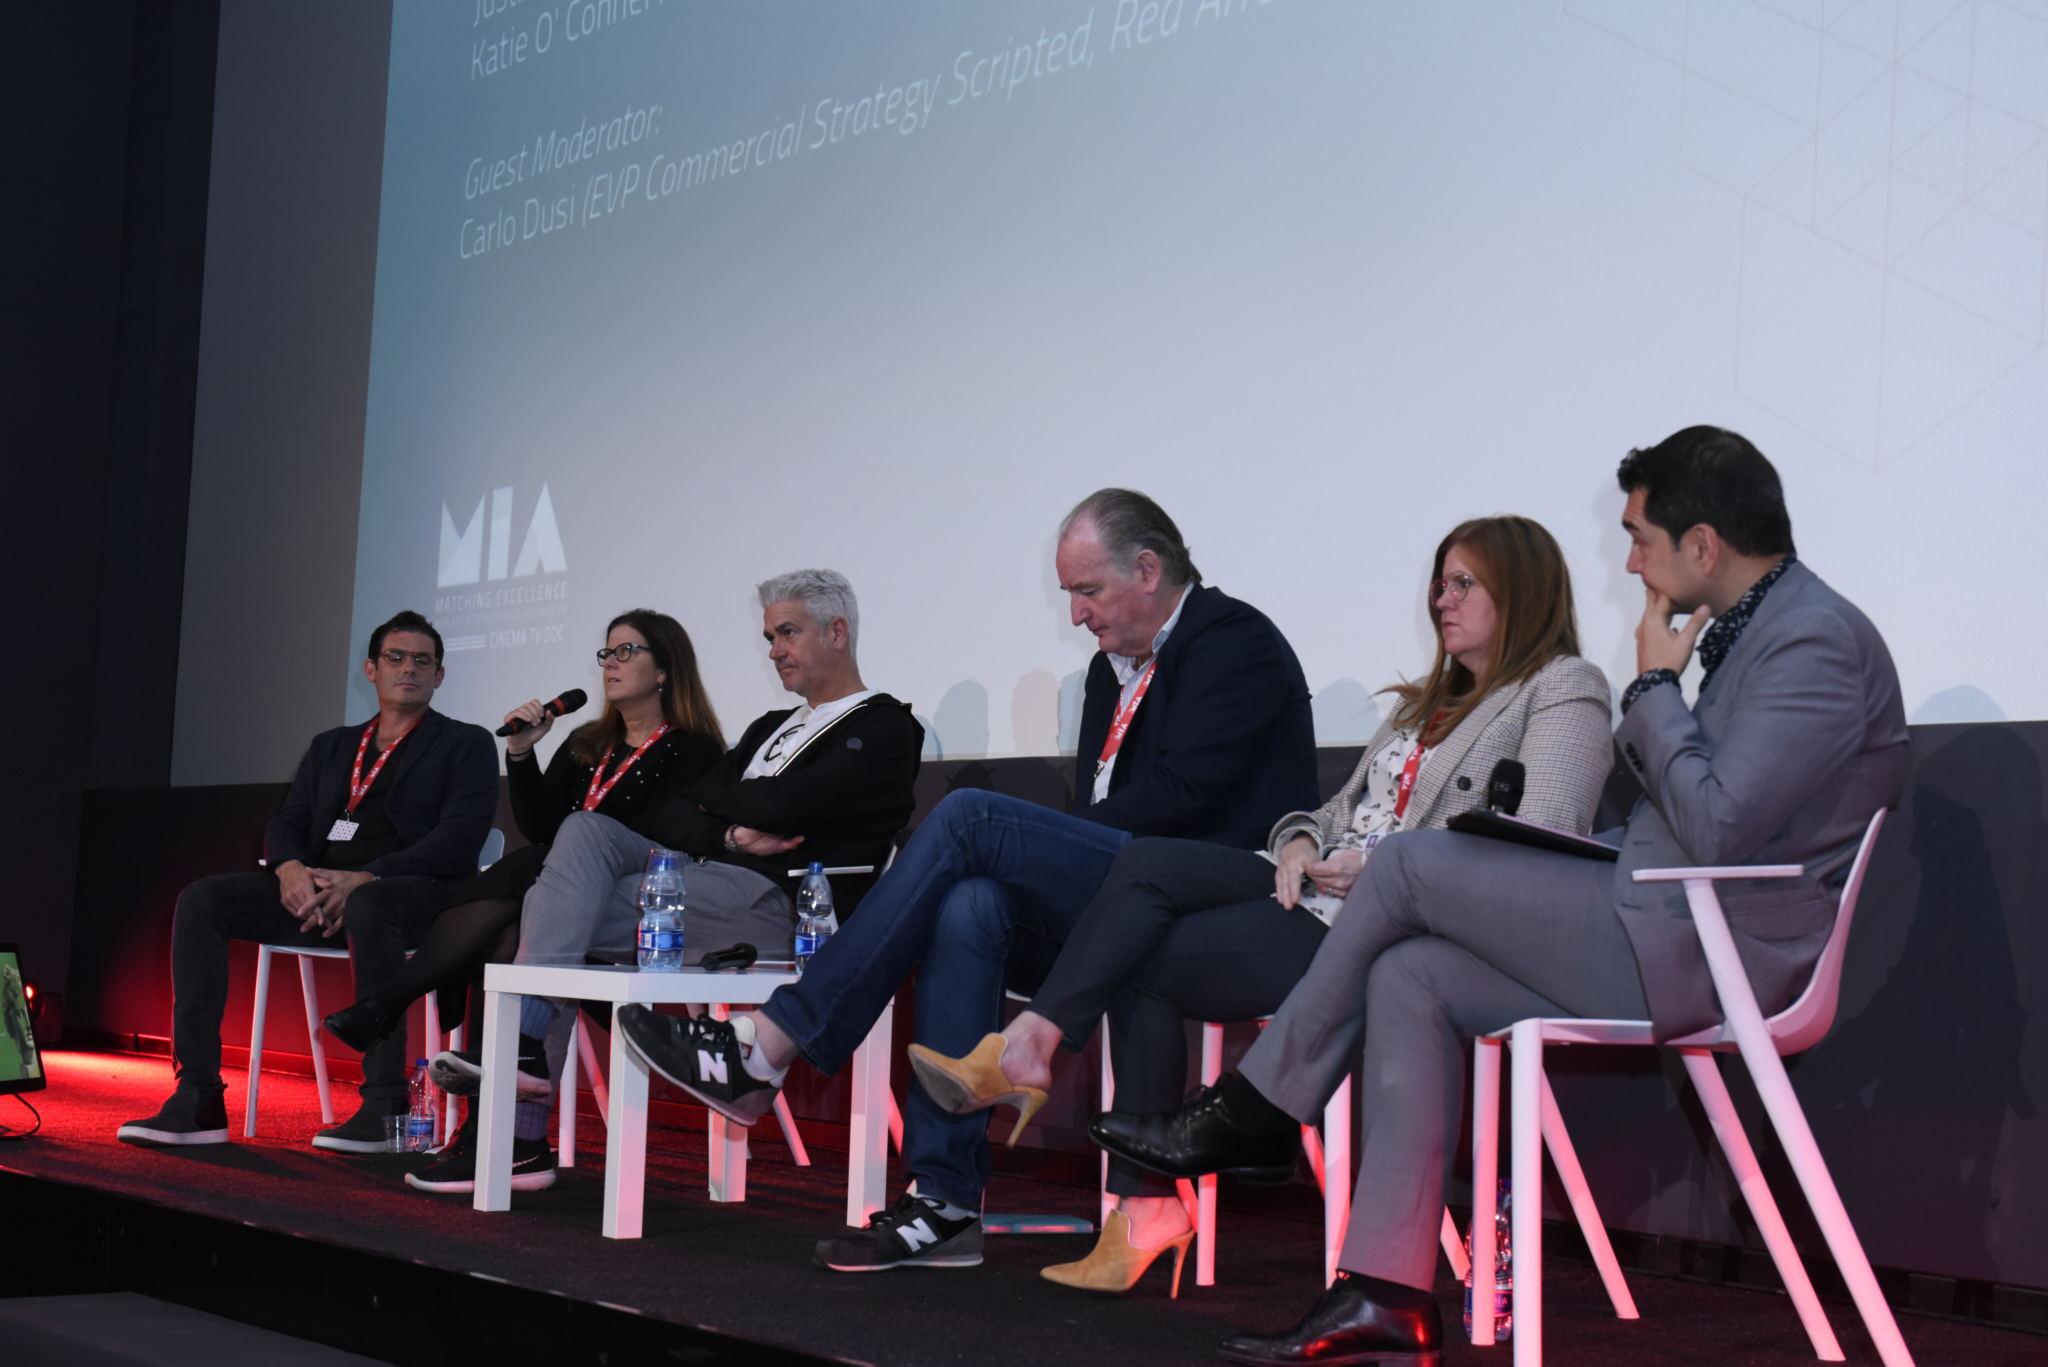 Sean Furst, Eleonora Andreatta, Nils Hartmann, Katie O'Connell Marsh, Carlo Dusi